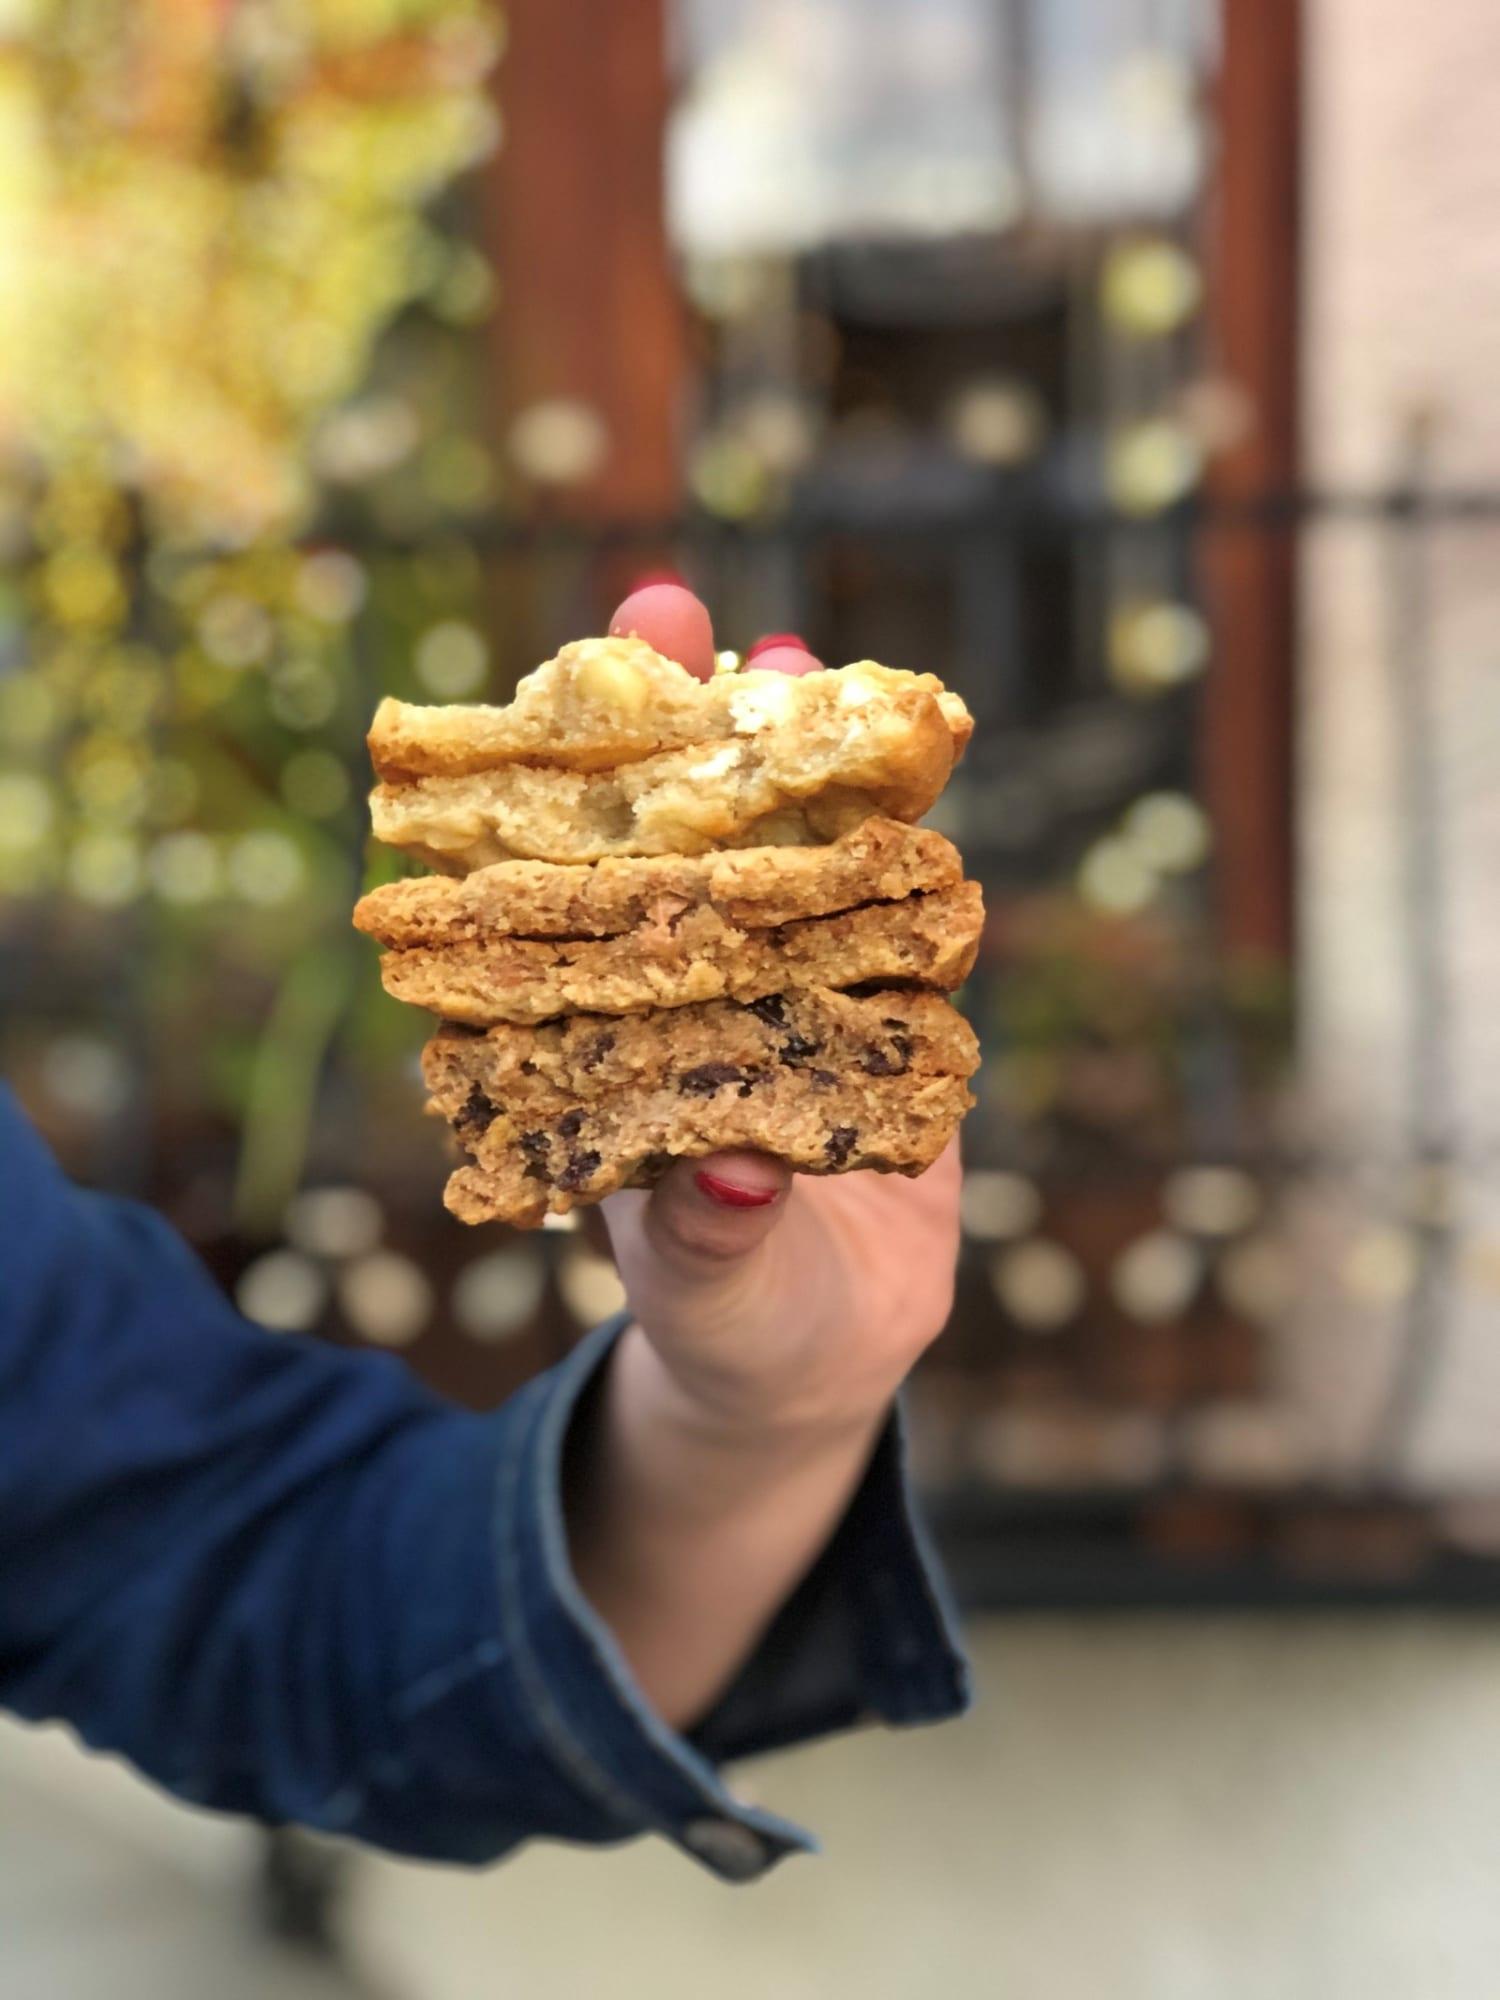 Insomnia Cookies launches three new vegan cookies